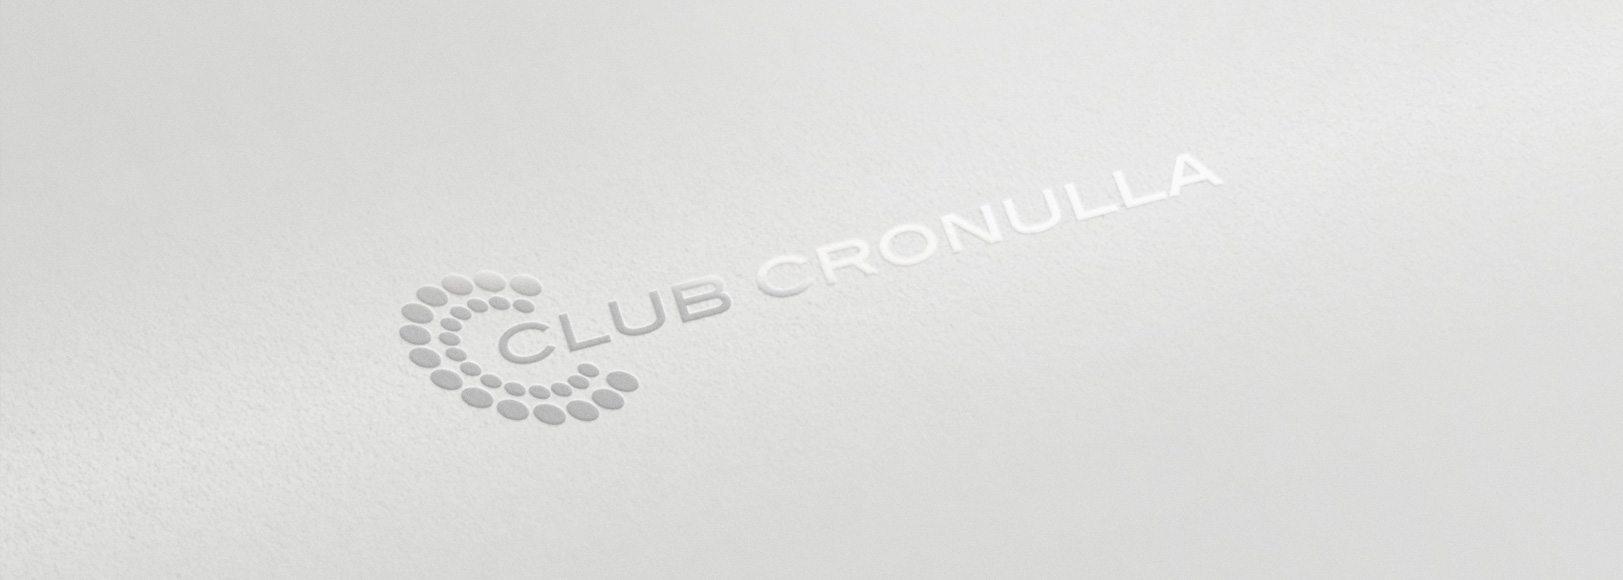 Club Cronulla - Cronulla Web Design - Branding & Logo Design